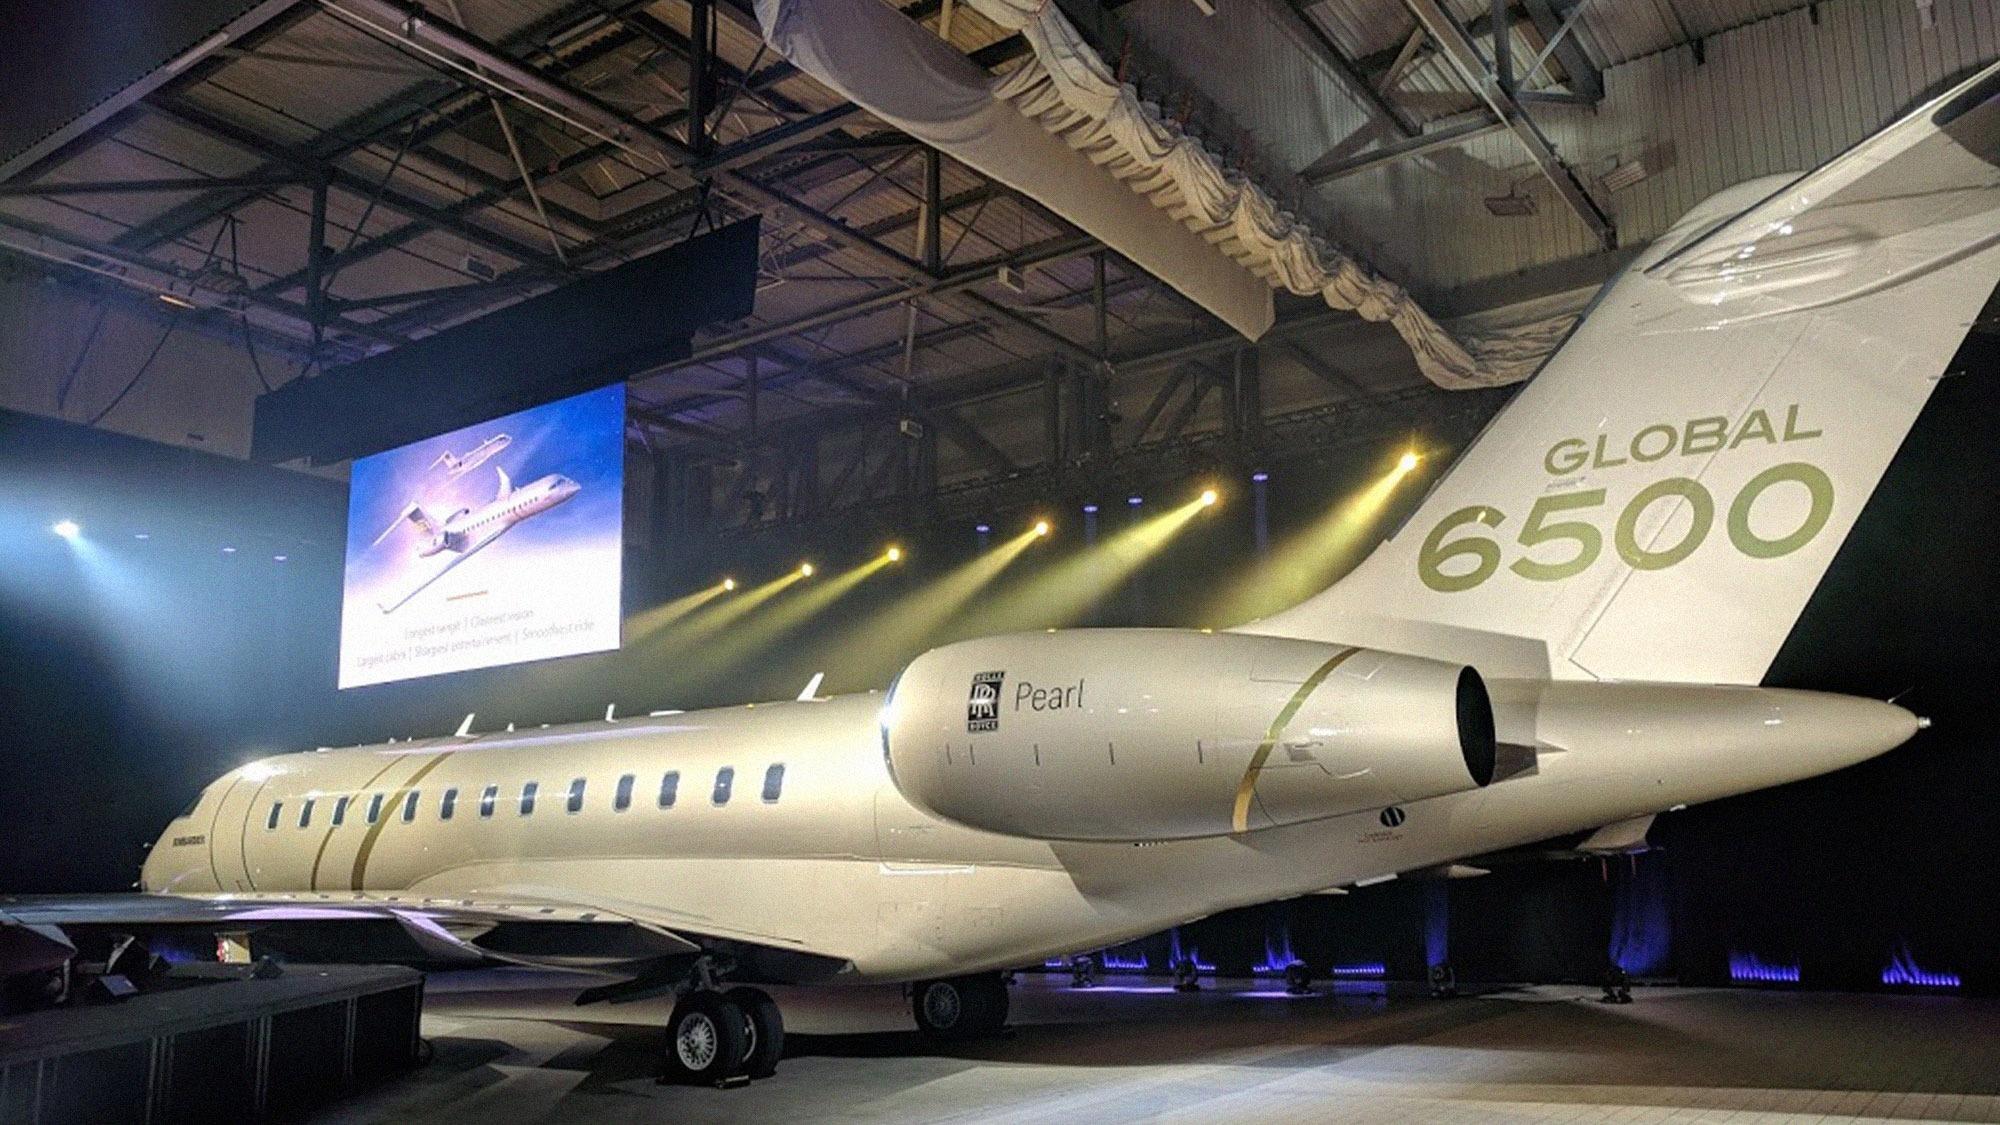 Bombardier Global 6500 Spy Shots